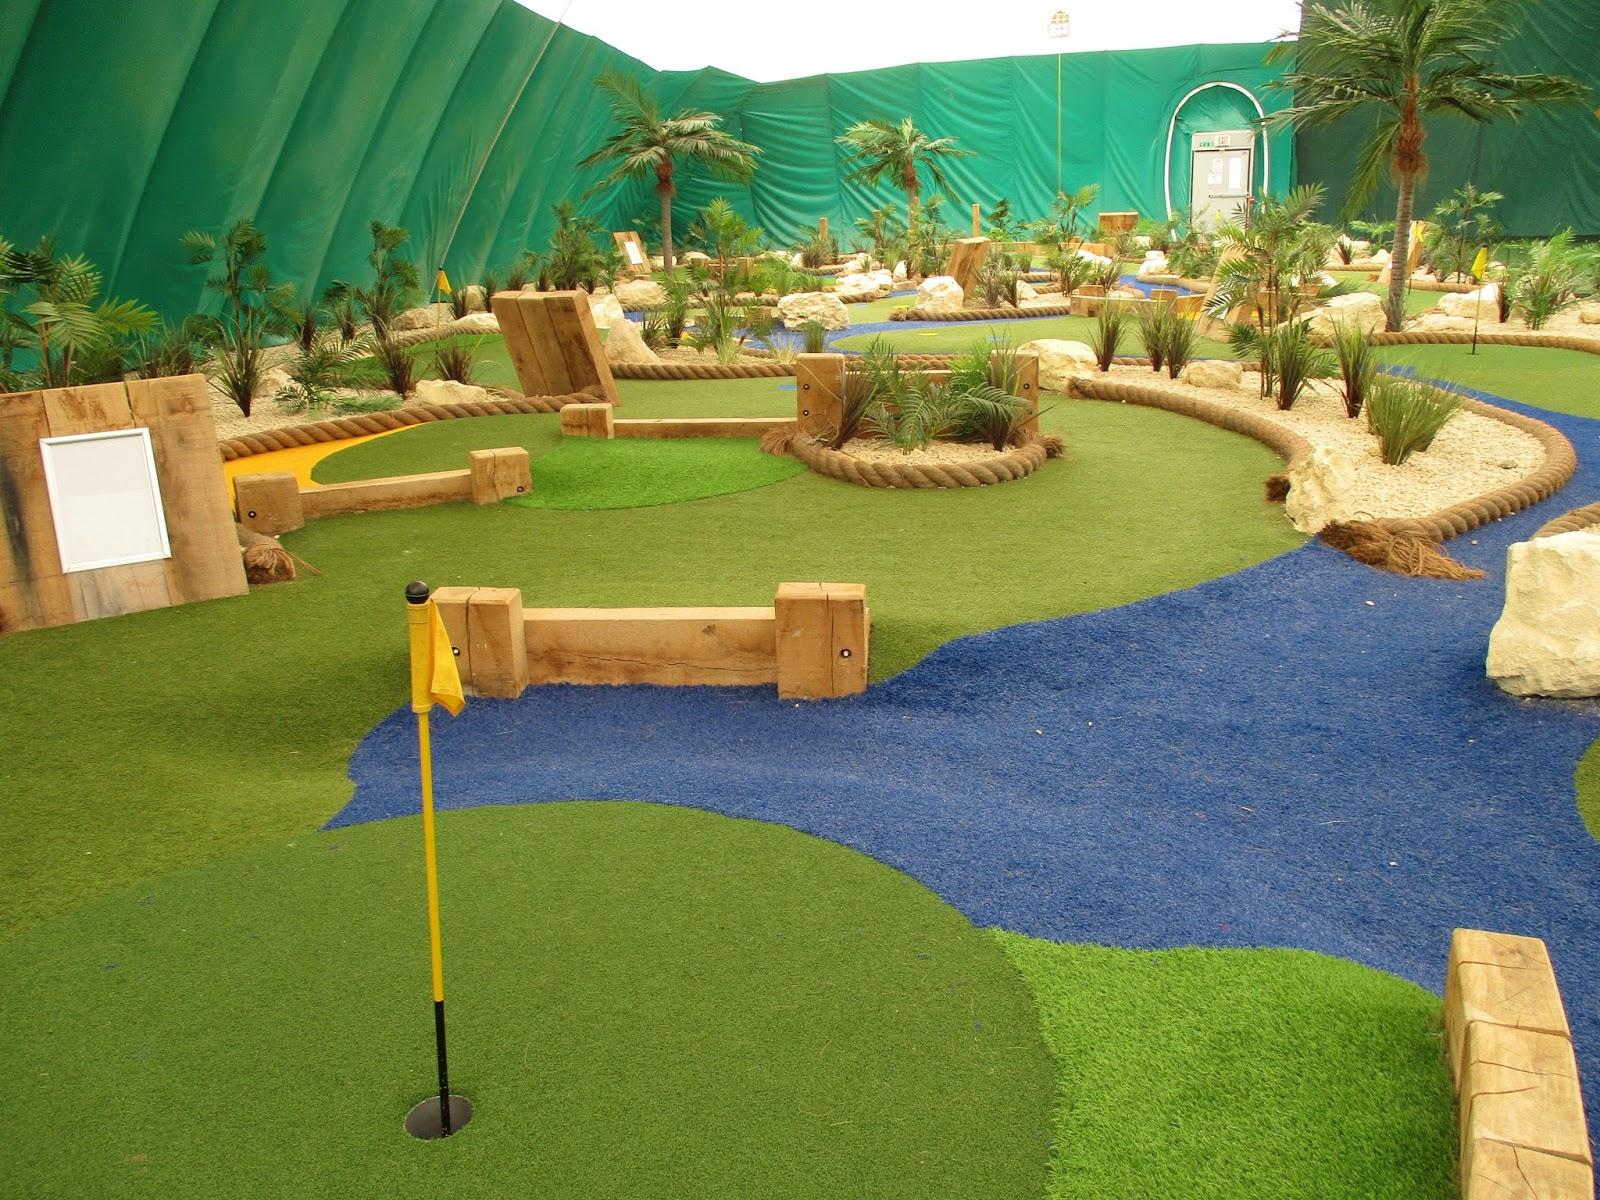 two crazy golfers jd golf dome seaton carew hartlepool